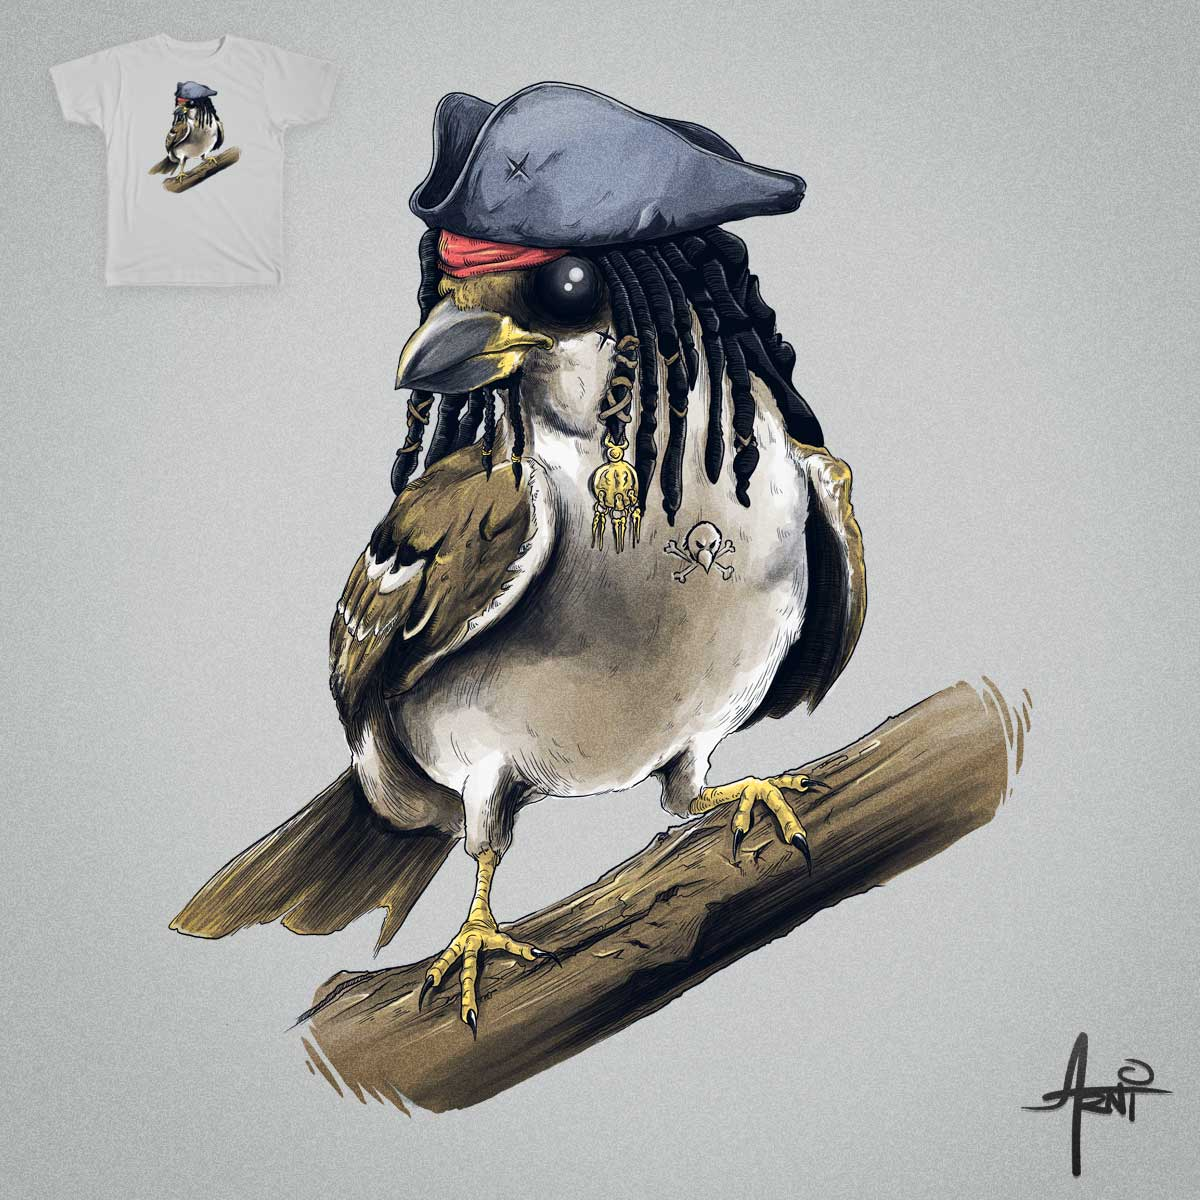 Sparrow by albertoarni on Threadless